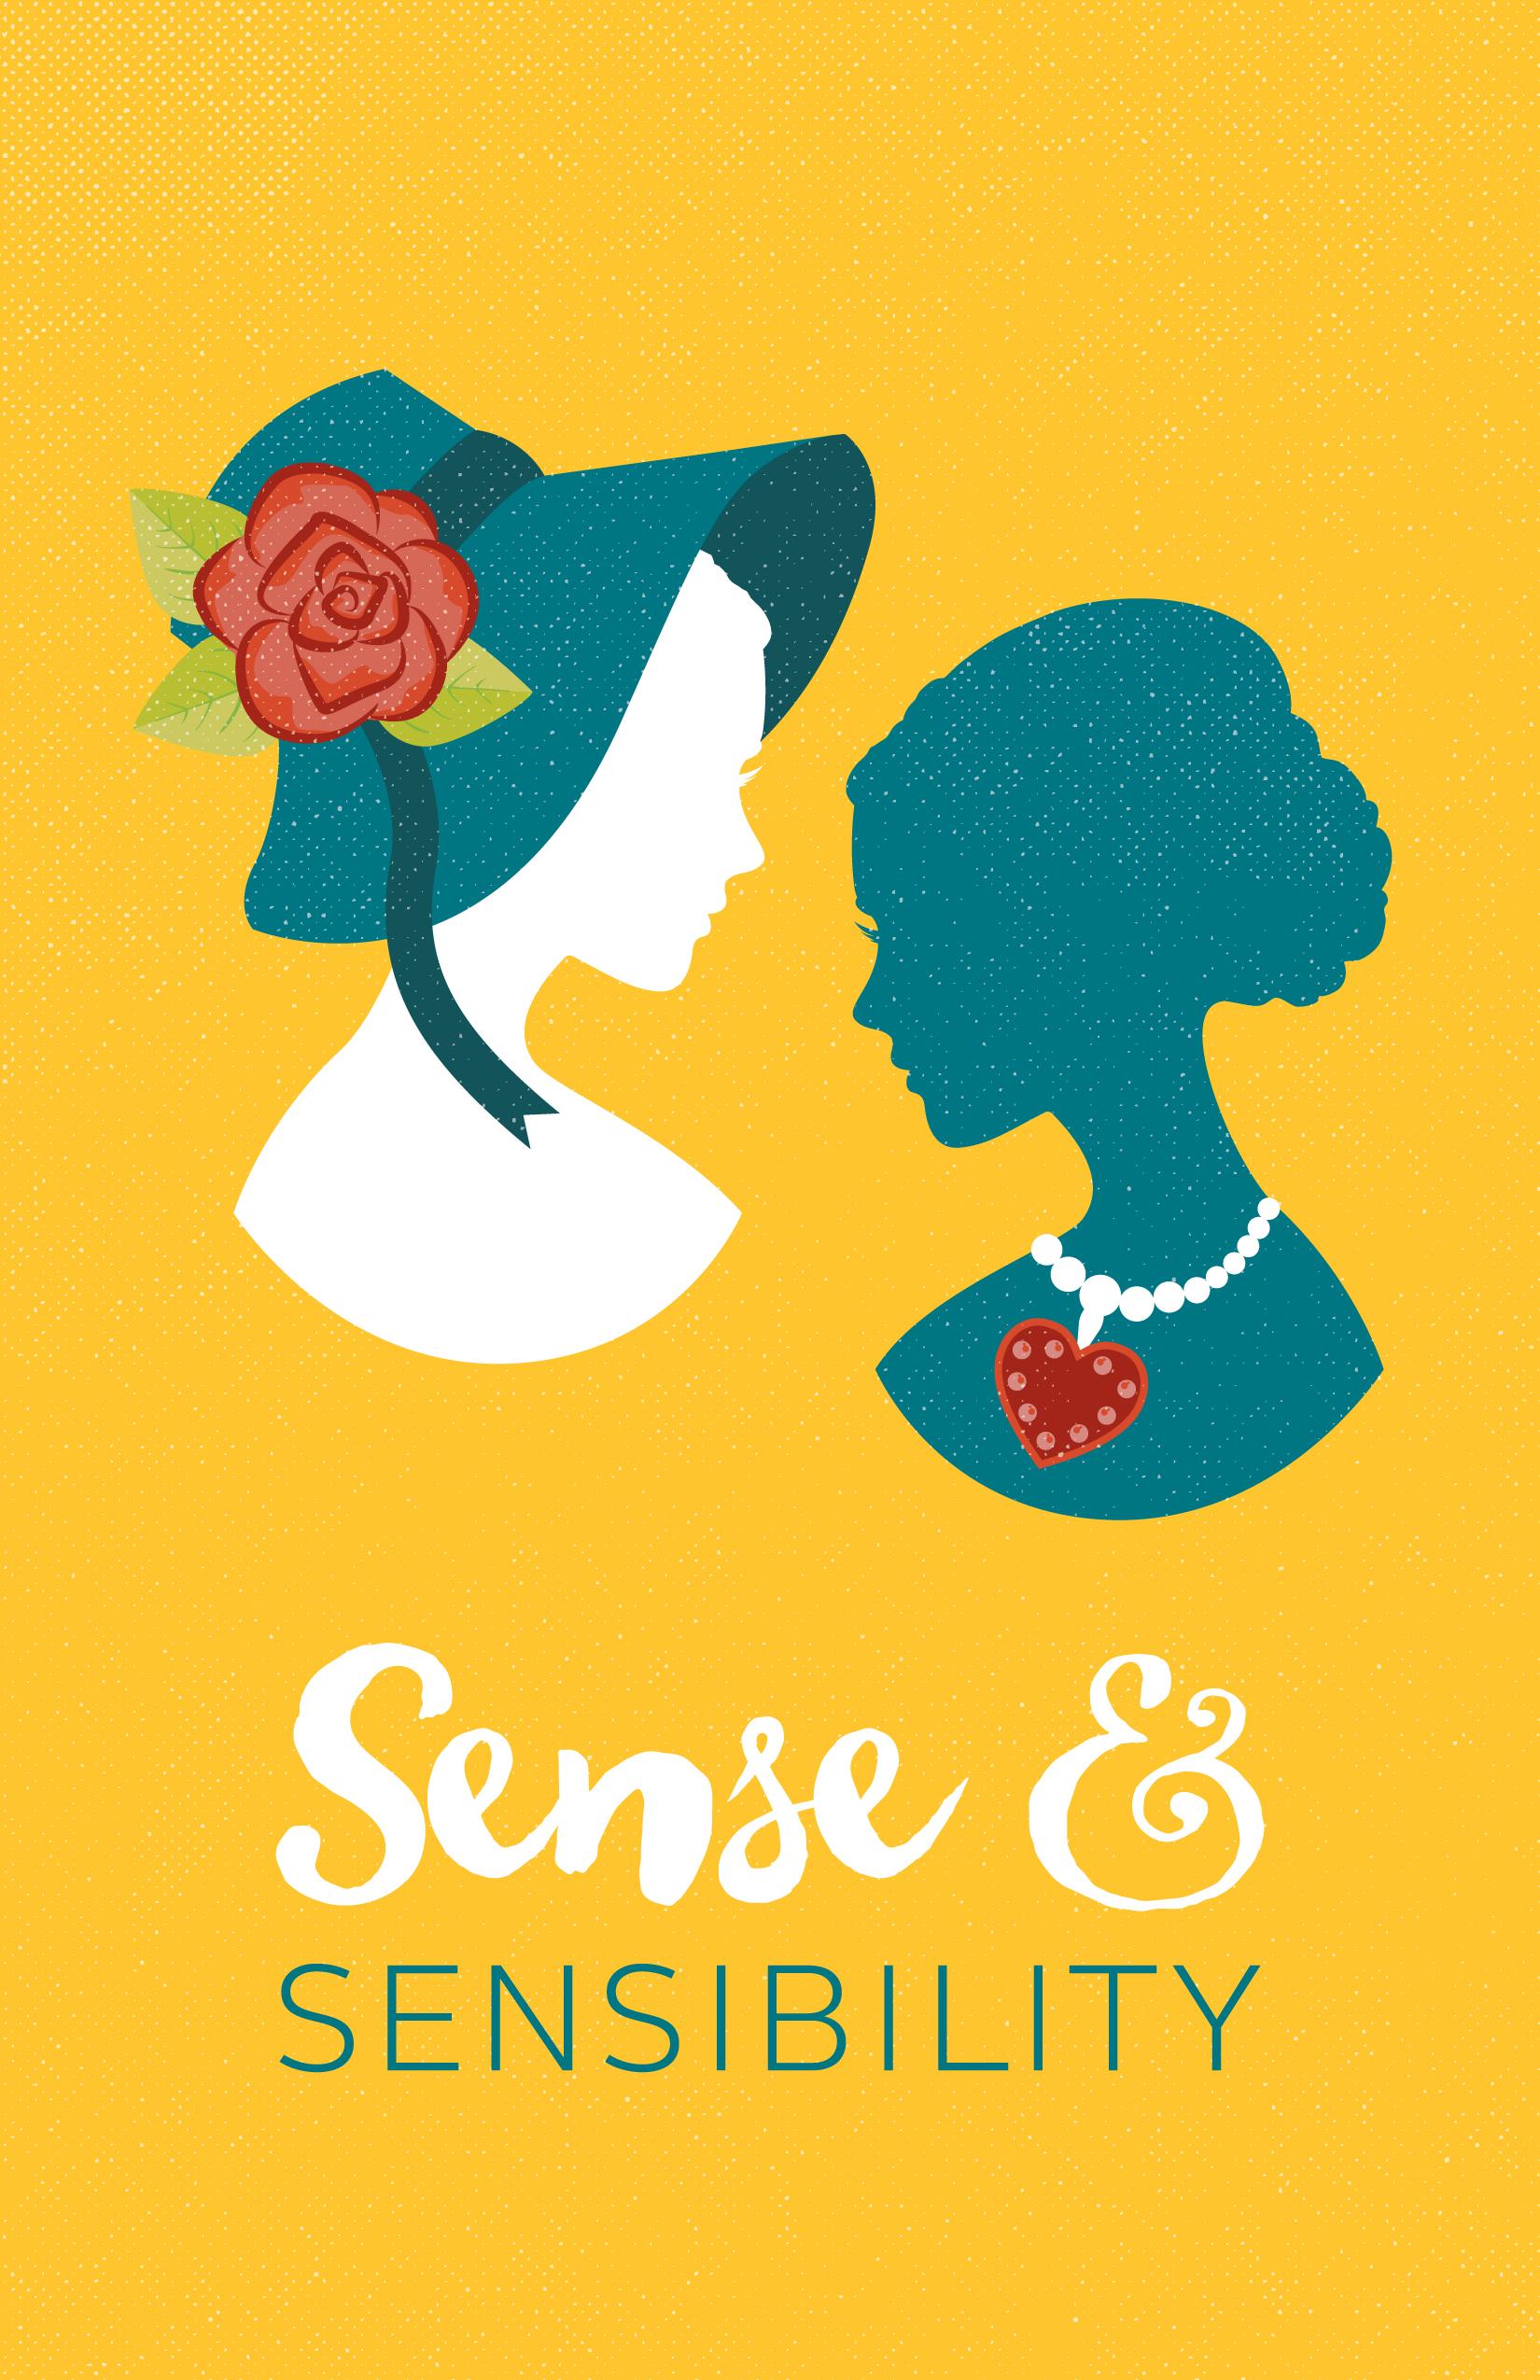 1819-06-Sense-and-Sensibility-Show-Image-Vertical.jpg